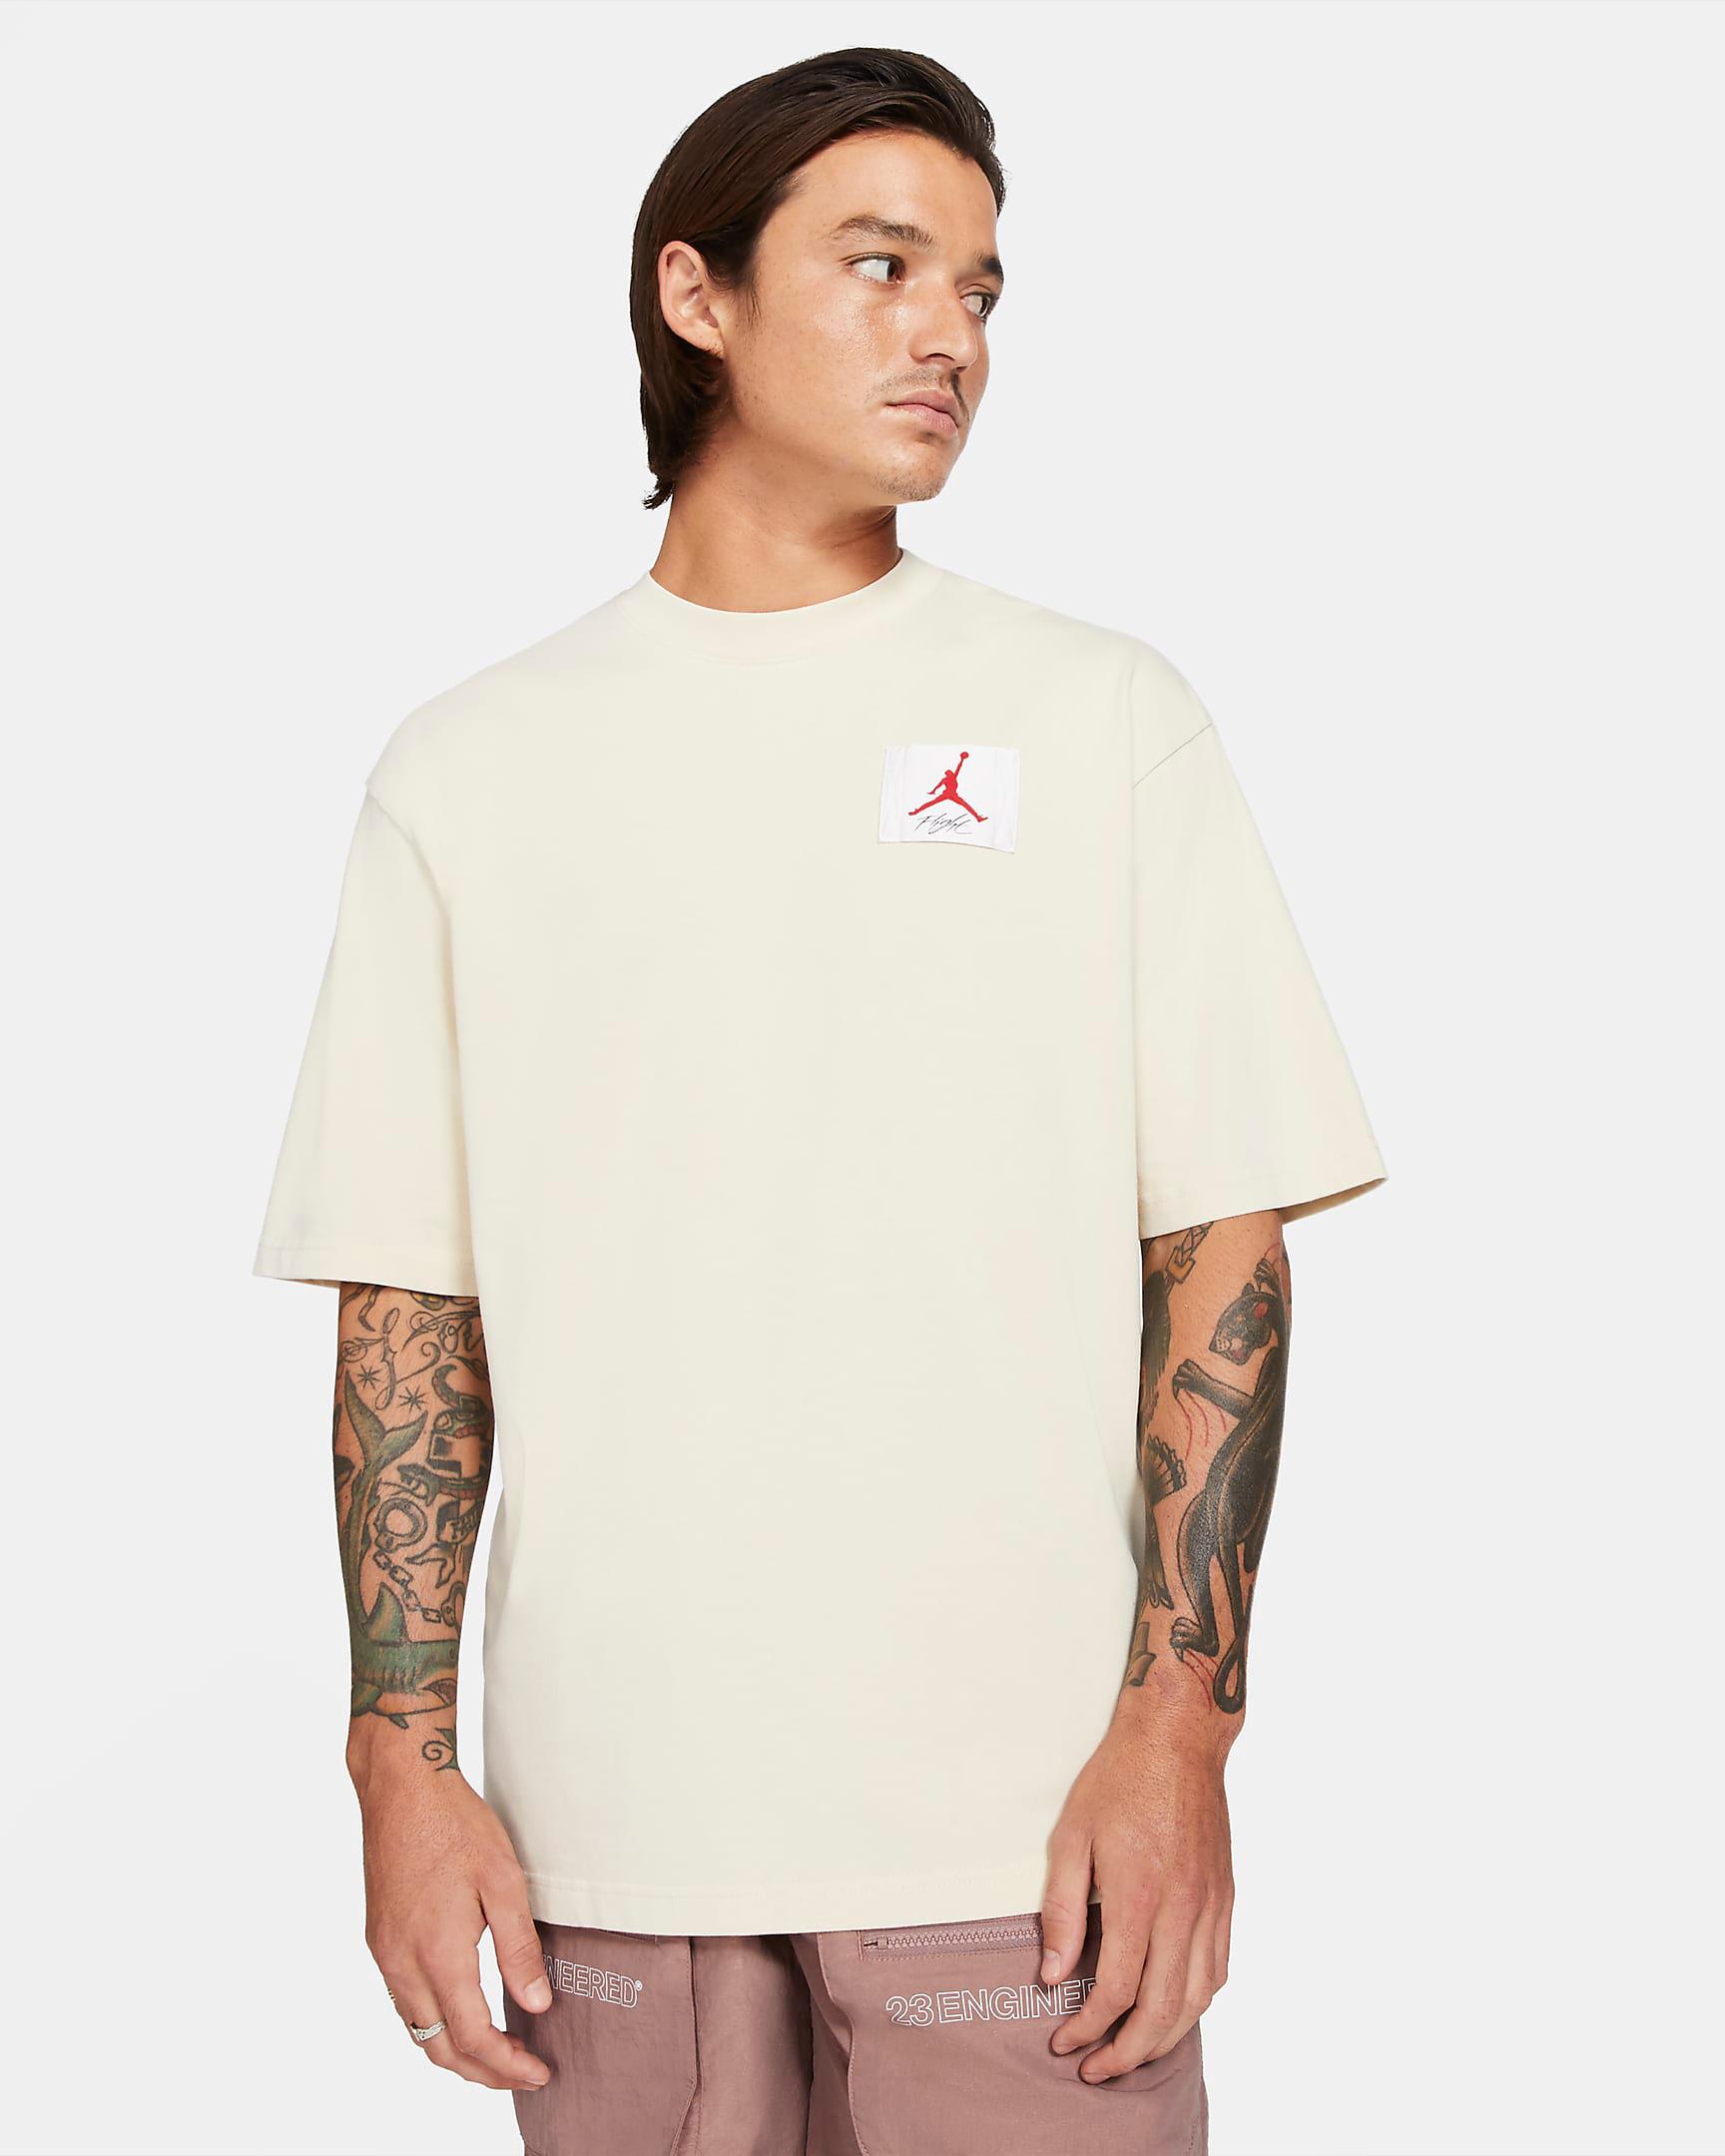 air-jordan-1-centre-court-white-university-red-banned-shirt-1